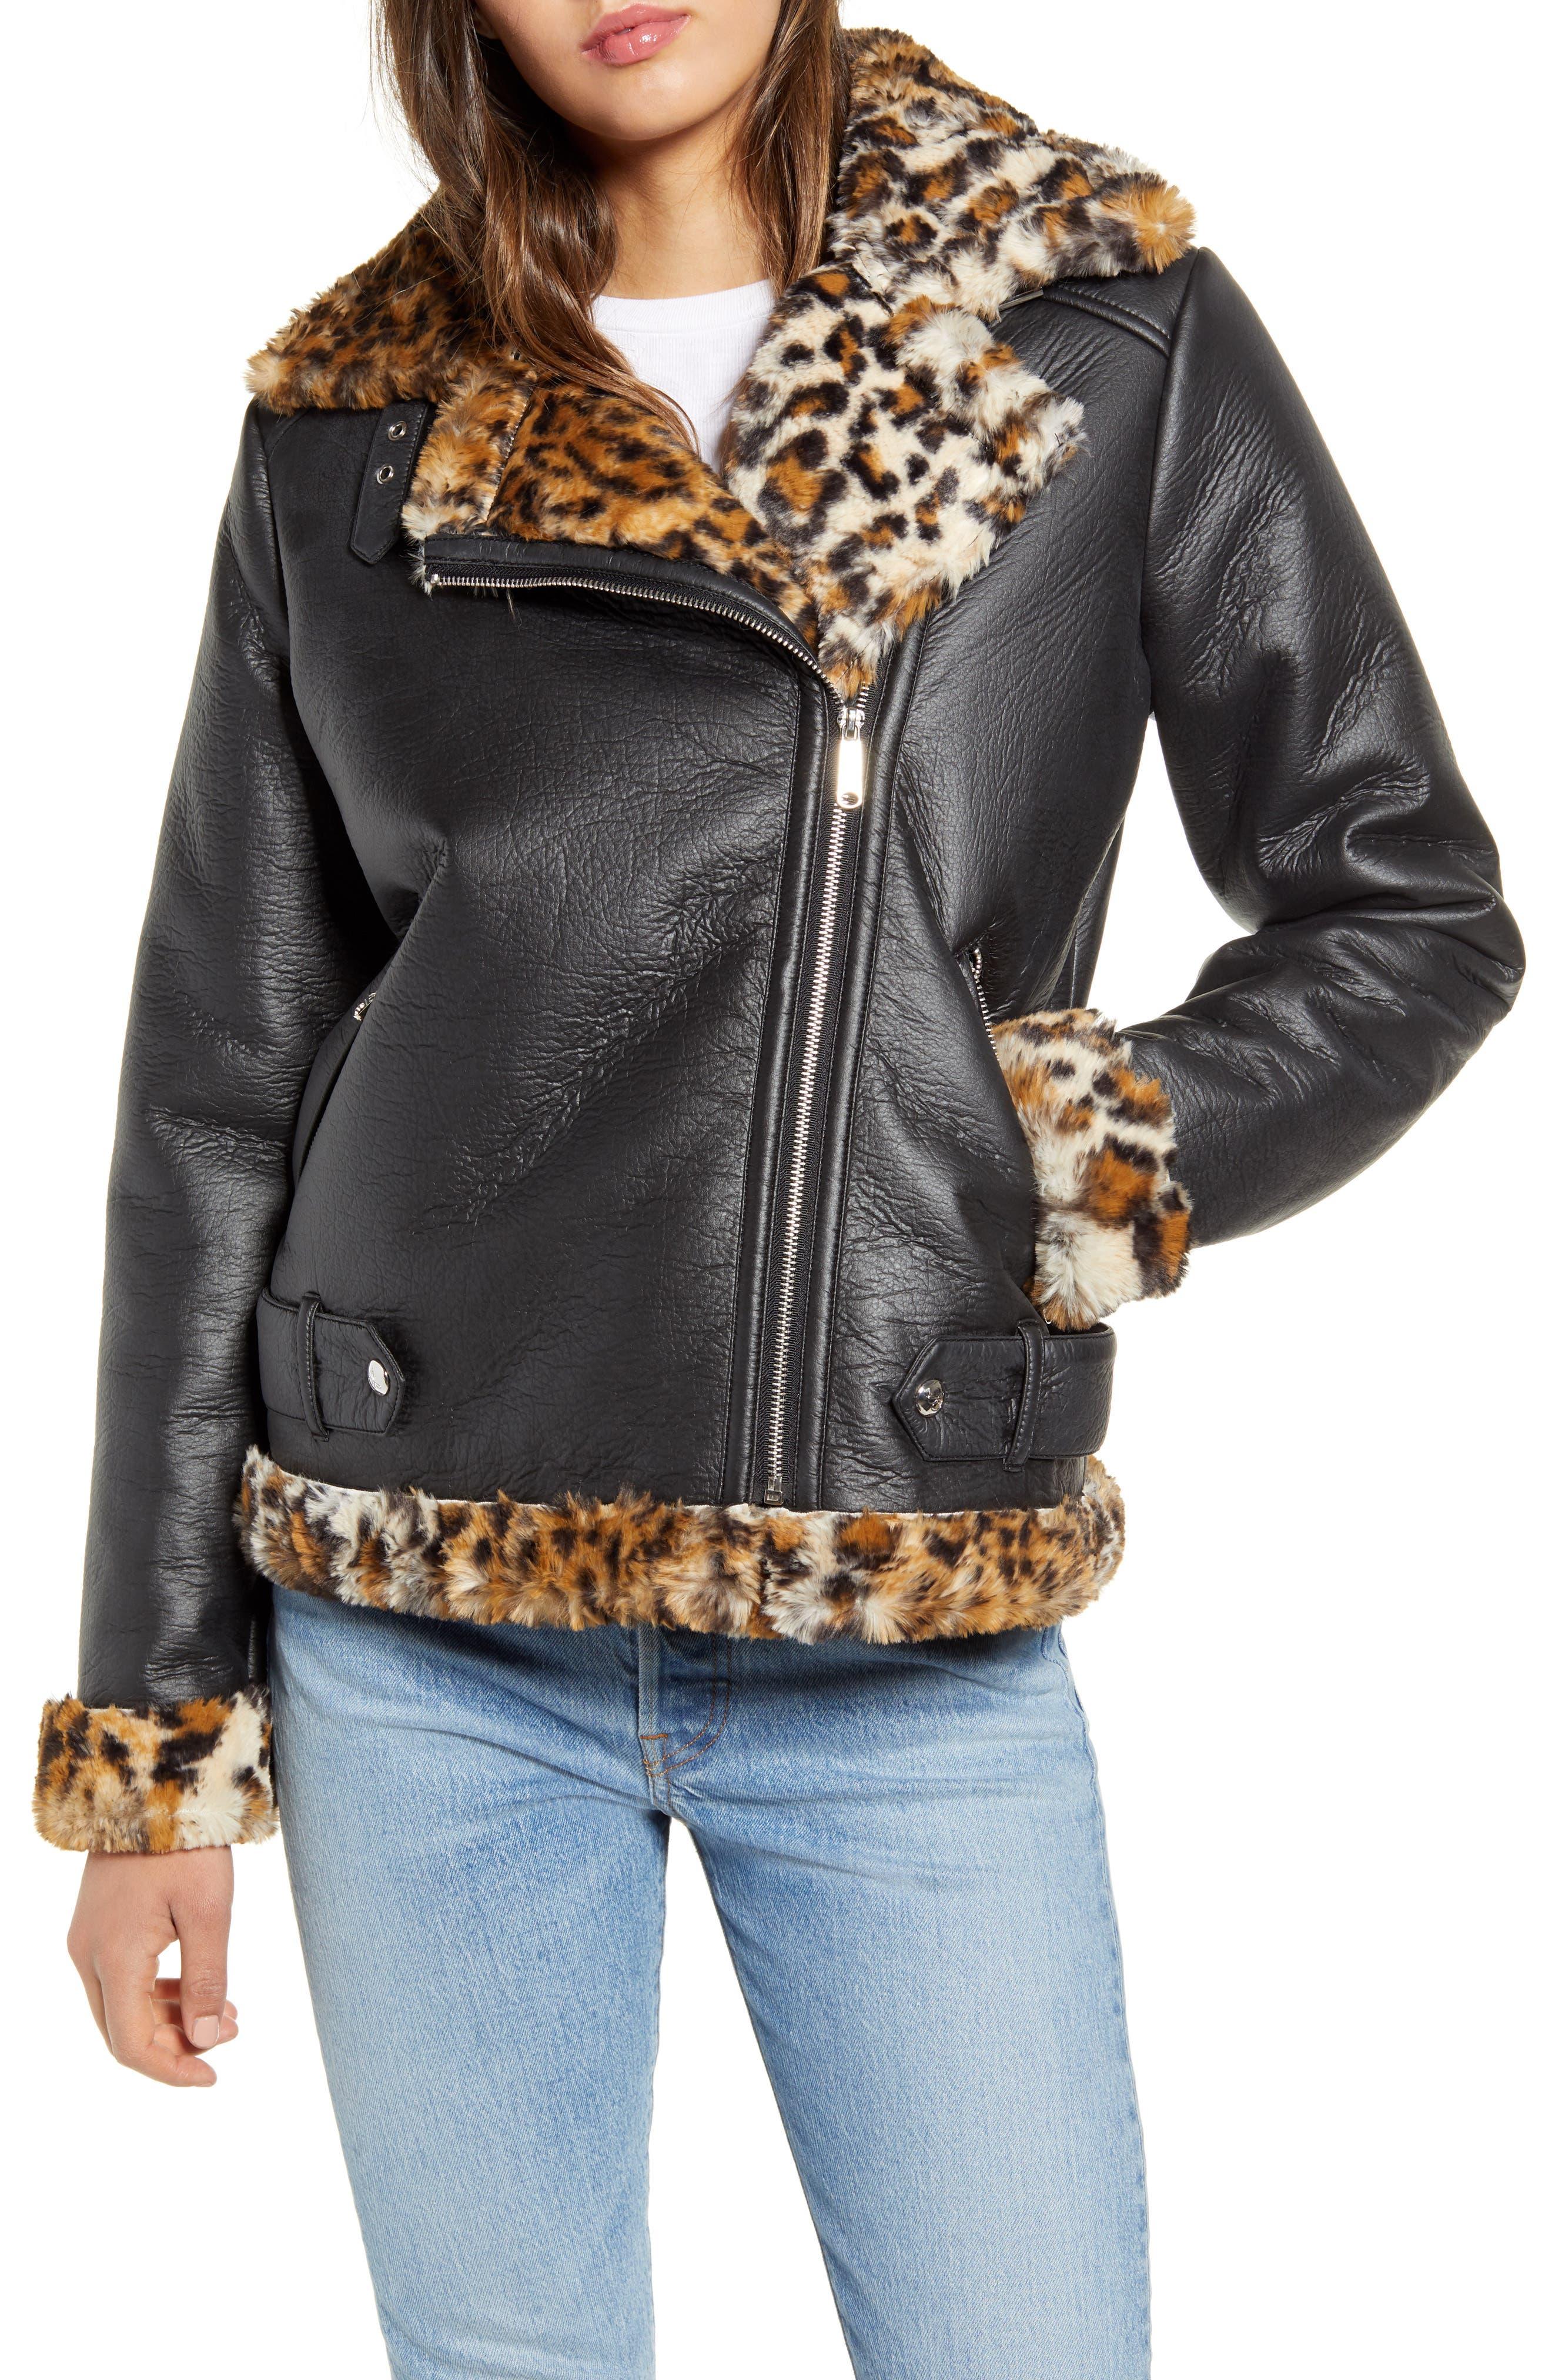 Image of Sam Edelman Oversize Faux Shearling Faux Leather Moto Jacket